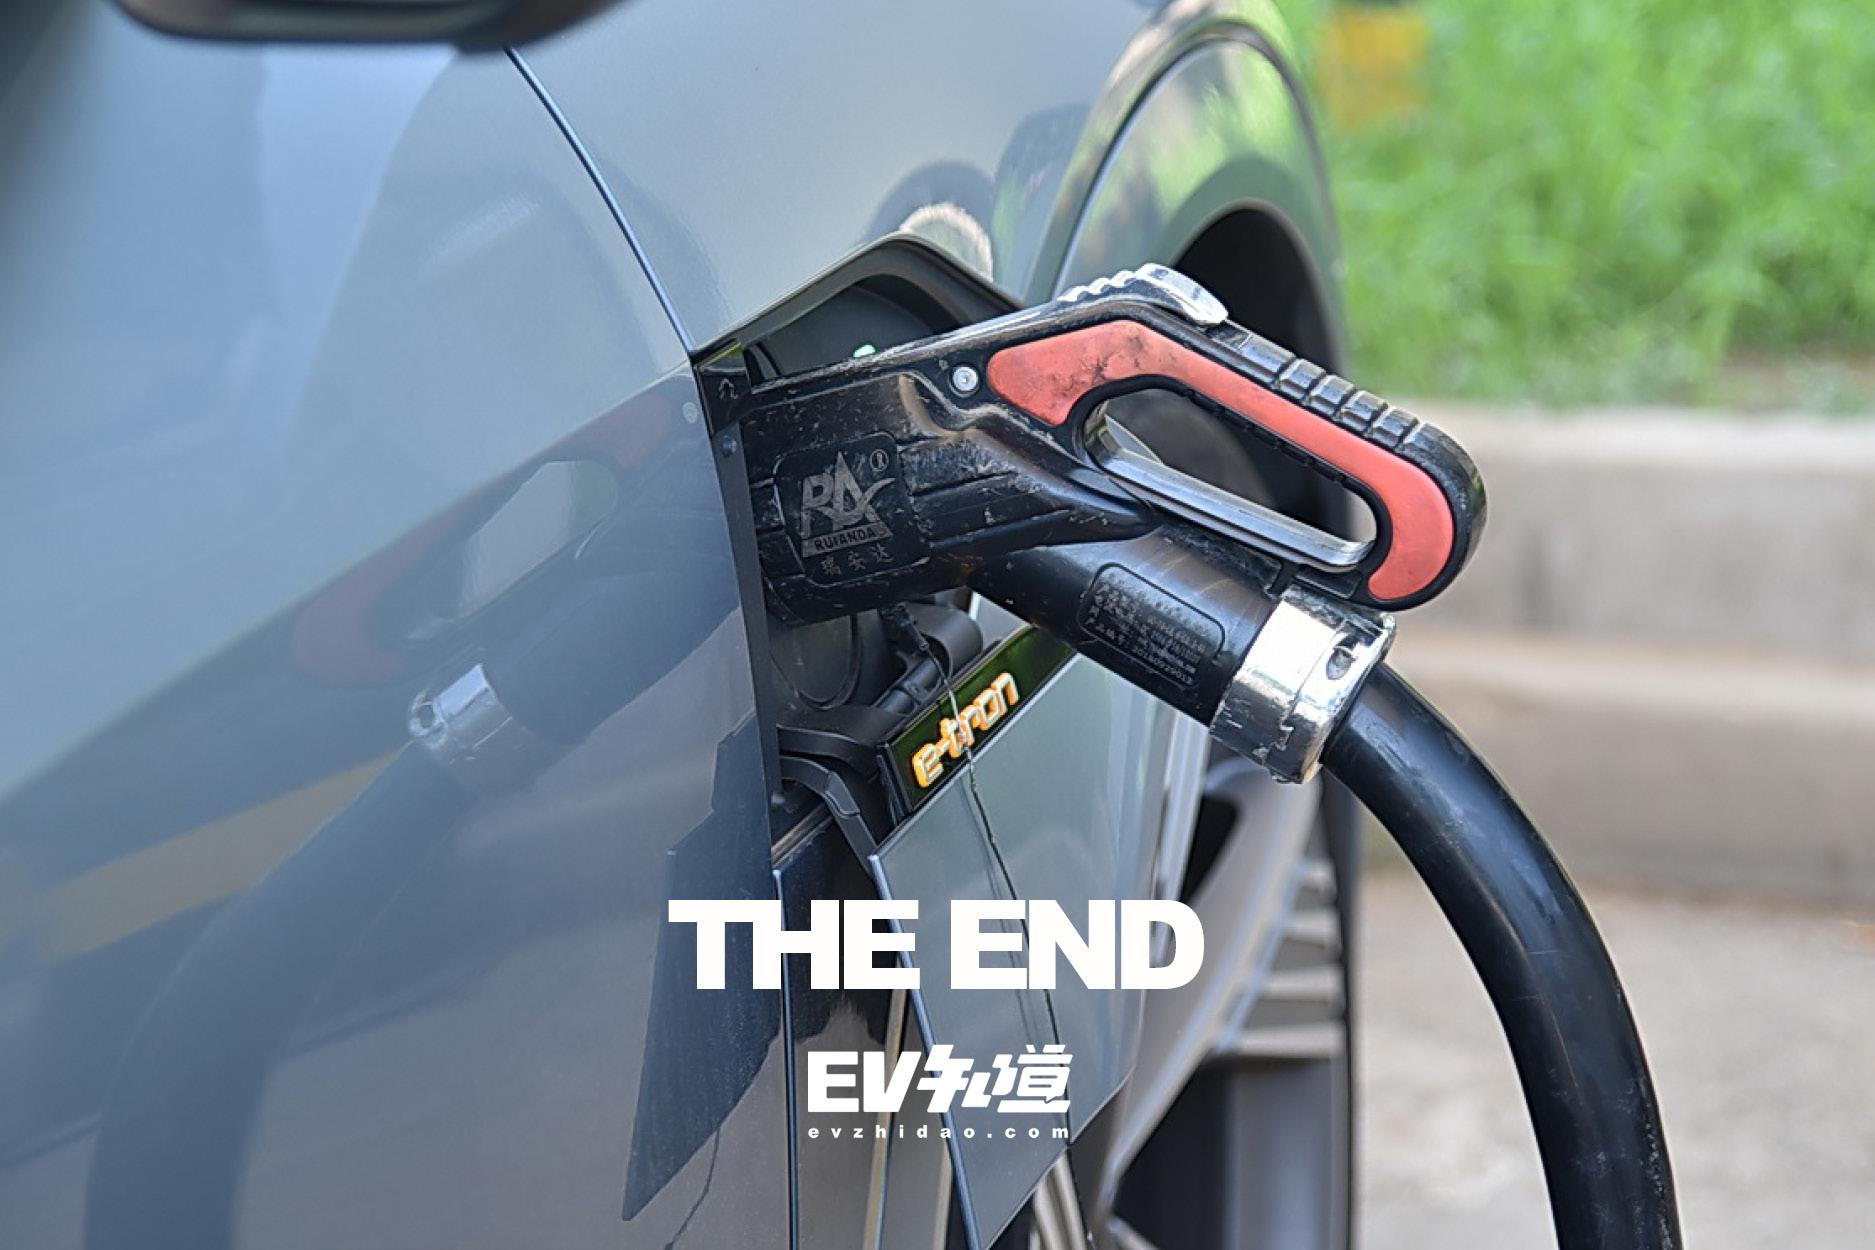 E-TEST 13:一汽-大众奥迪 e-tron电耗测试+试驾体验